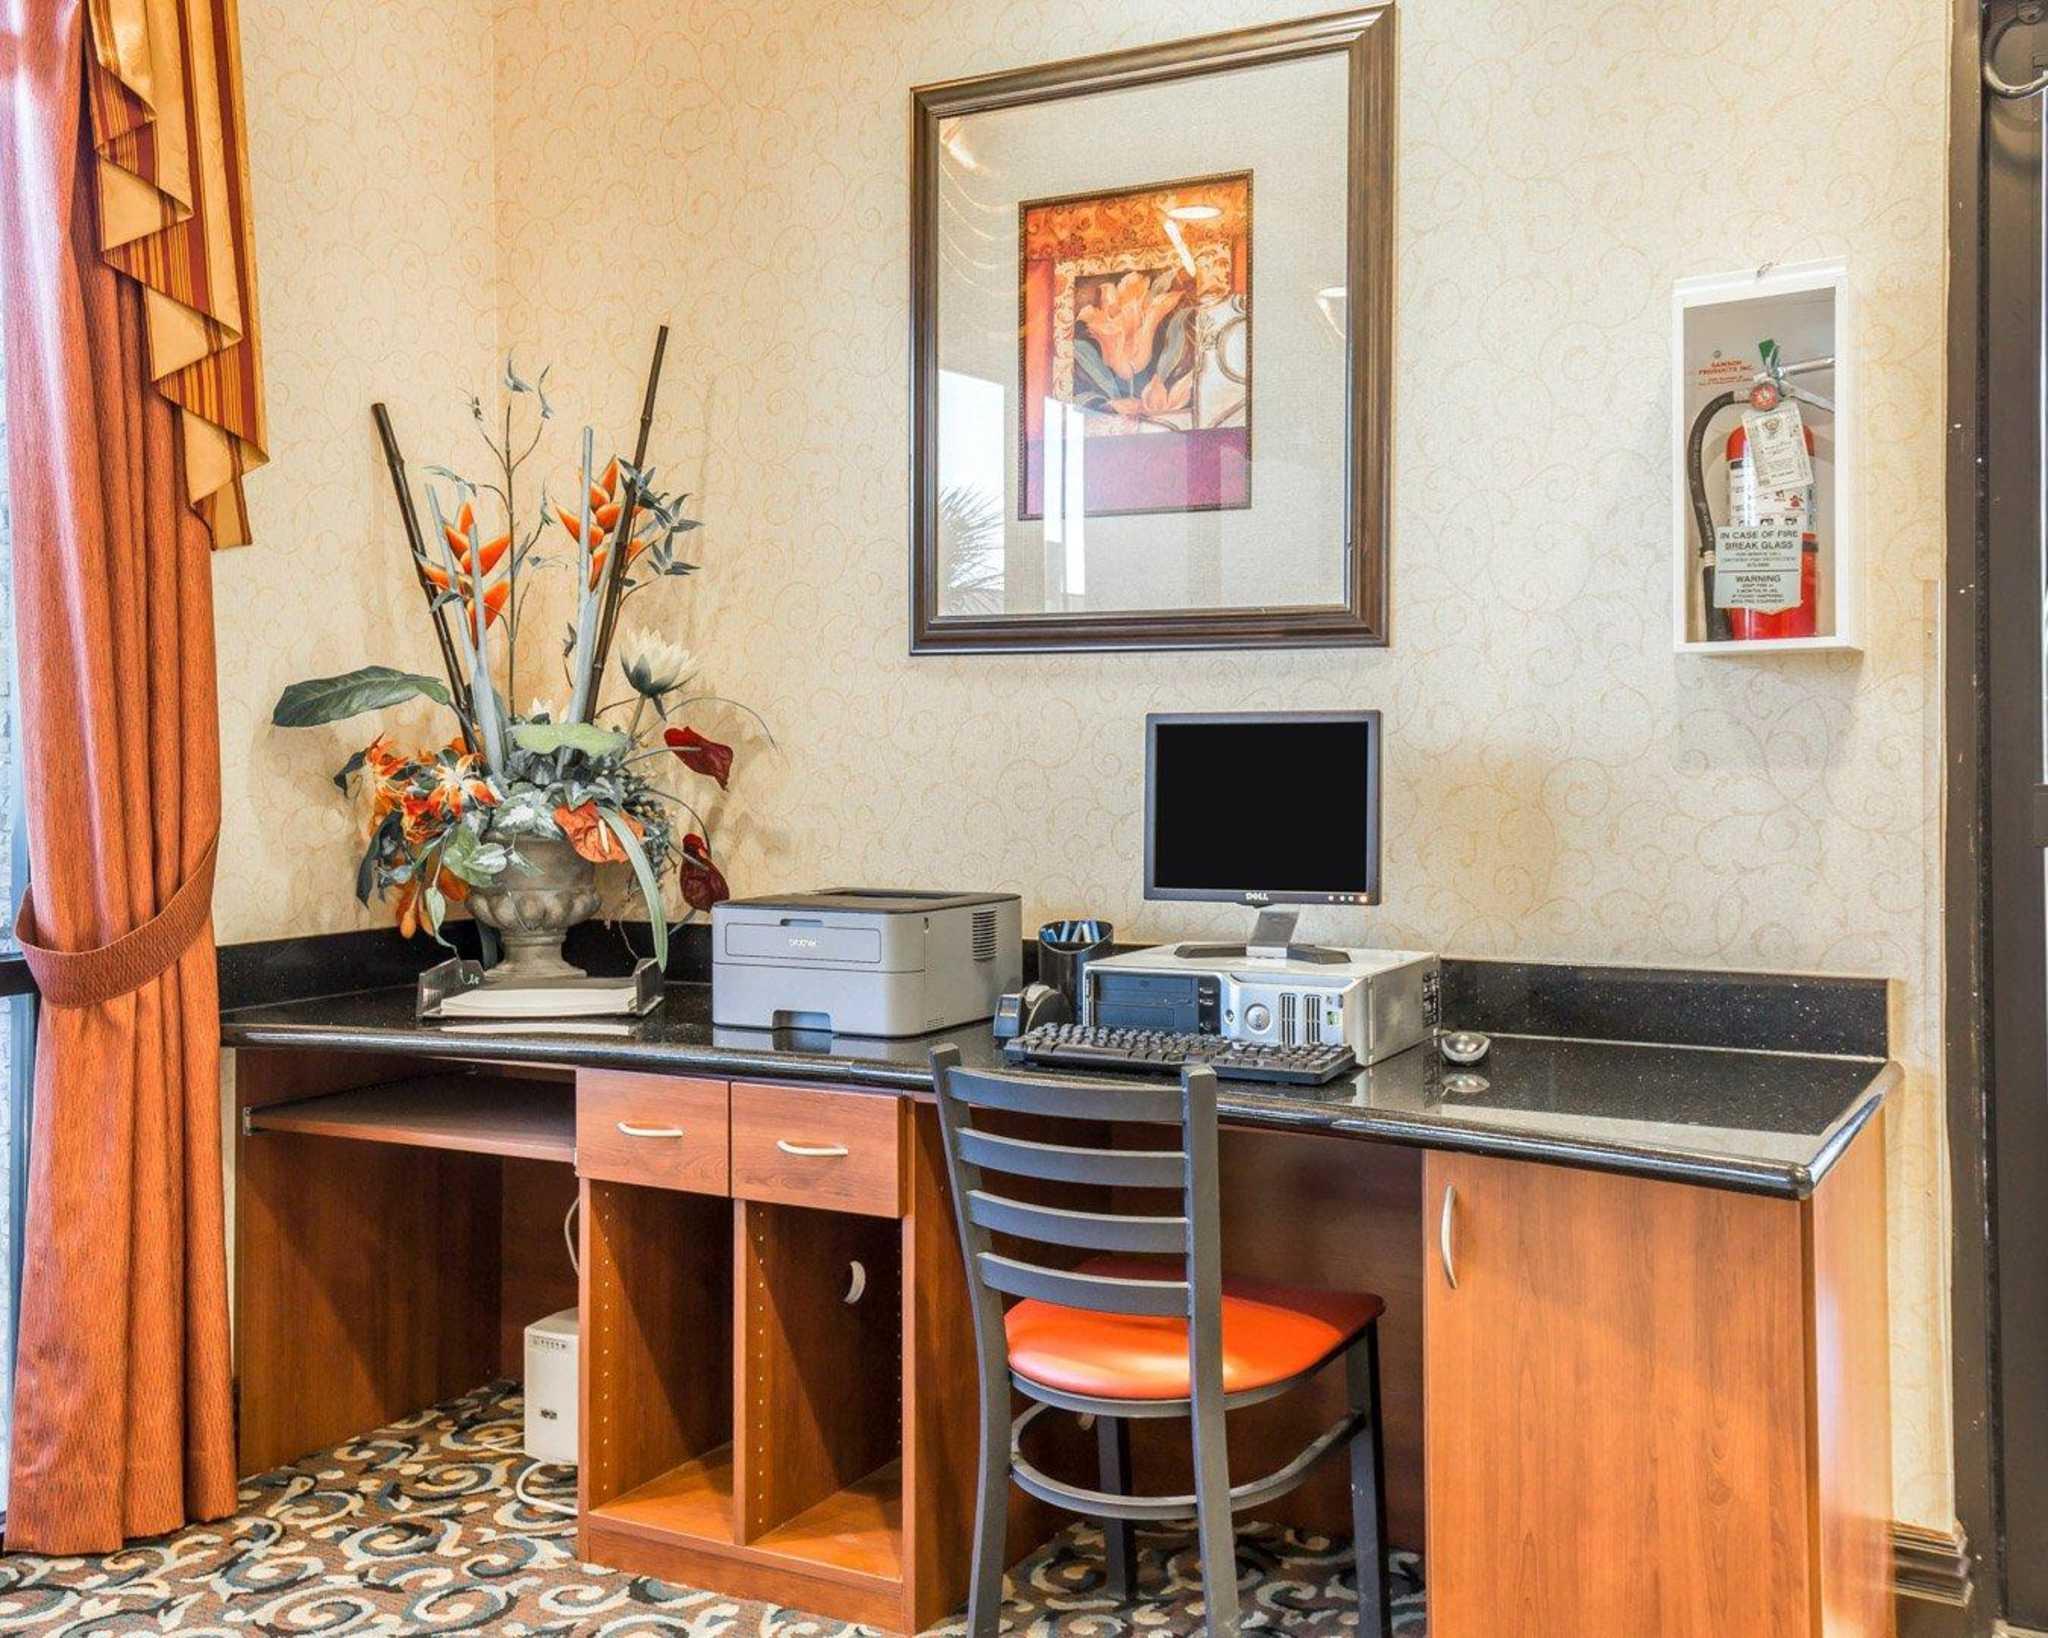 Comfort Inn & Suites Las Vegas - Nellis image 27